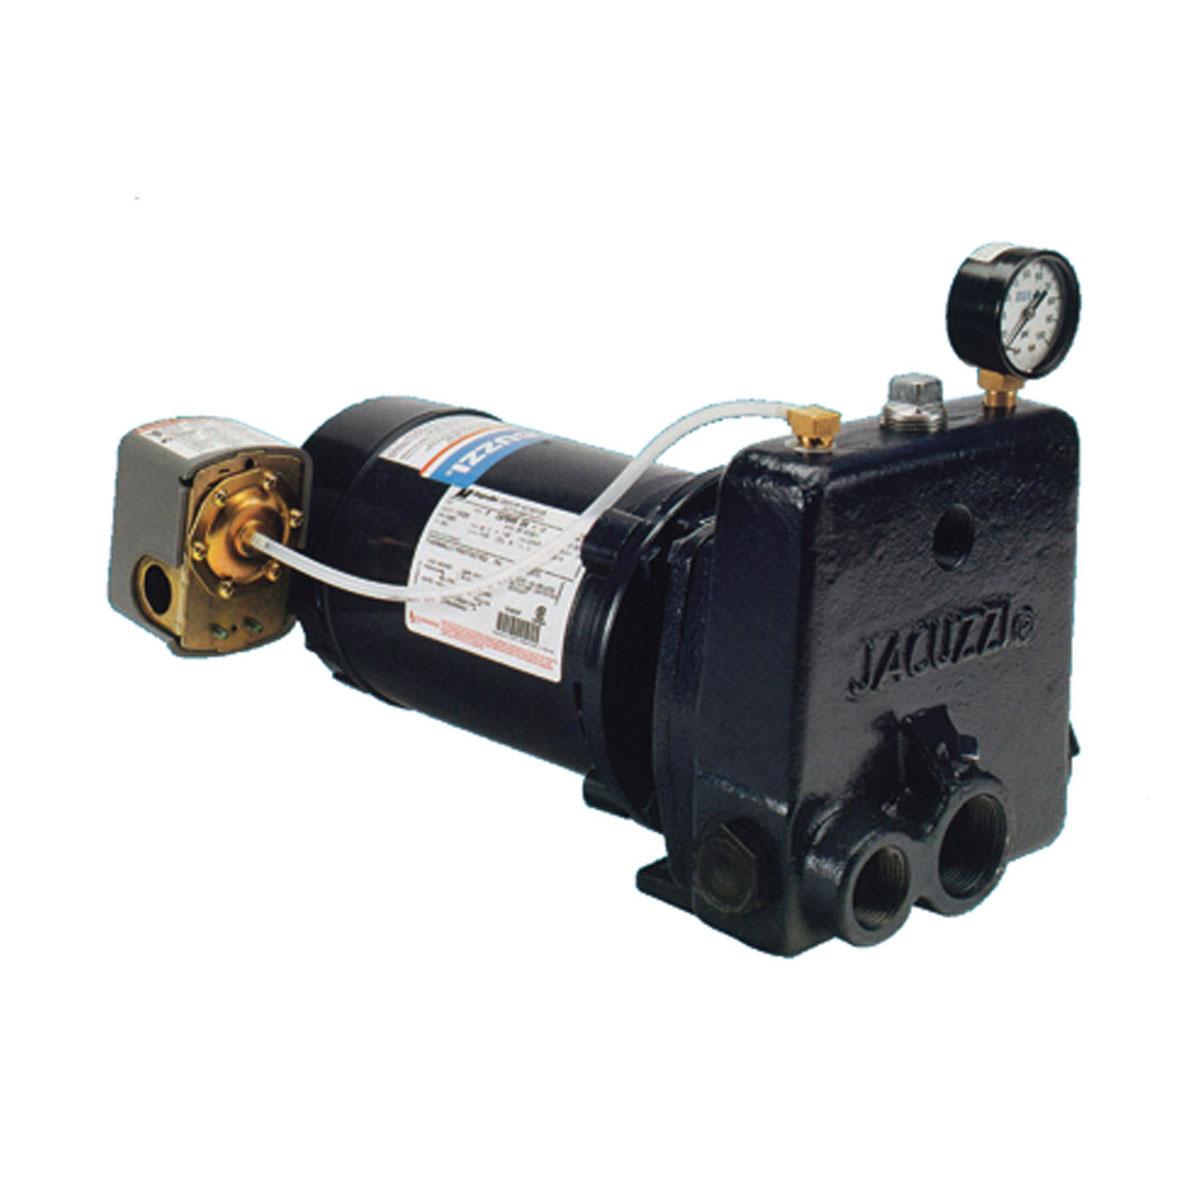 Franklin 5C-S (1/2 HP, 115/230v) Cast Iron Jet Pump